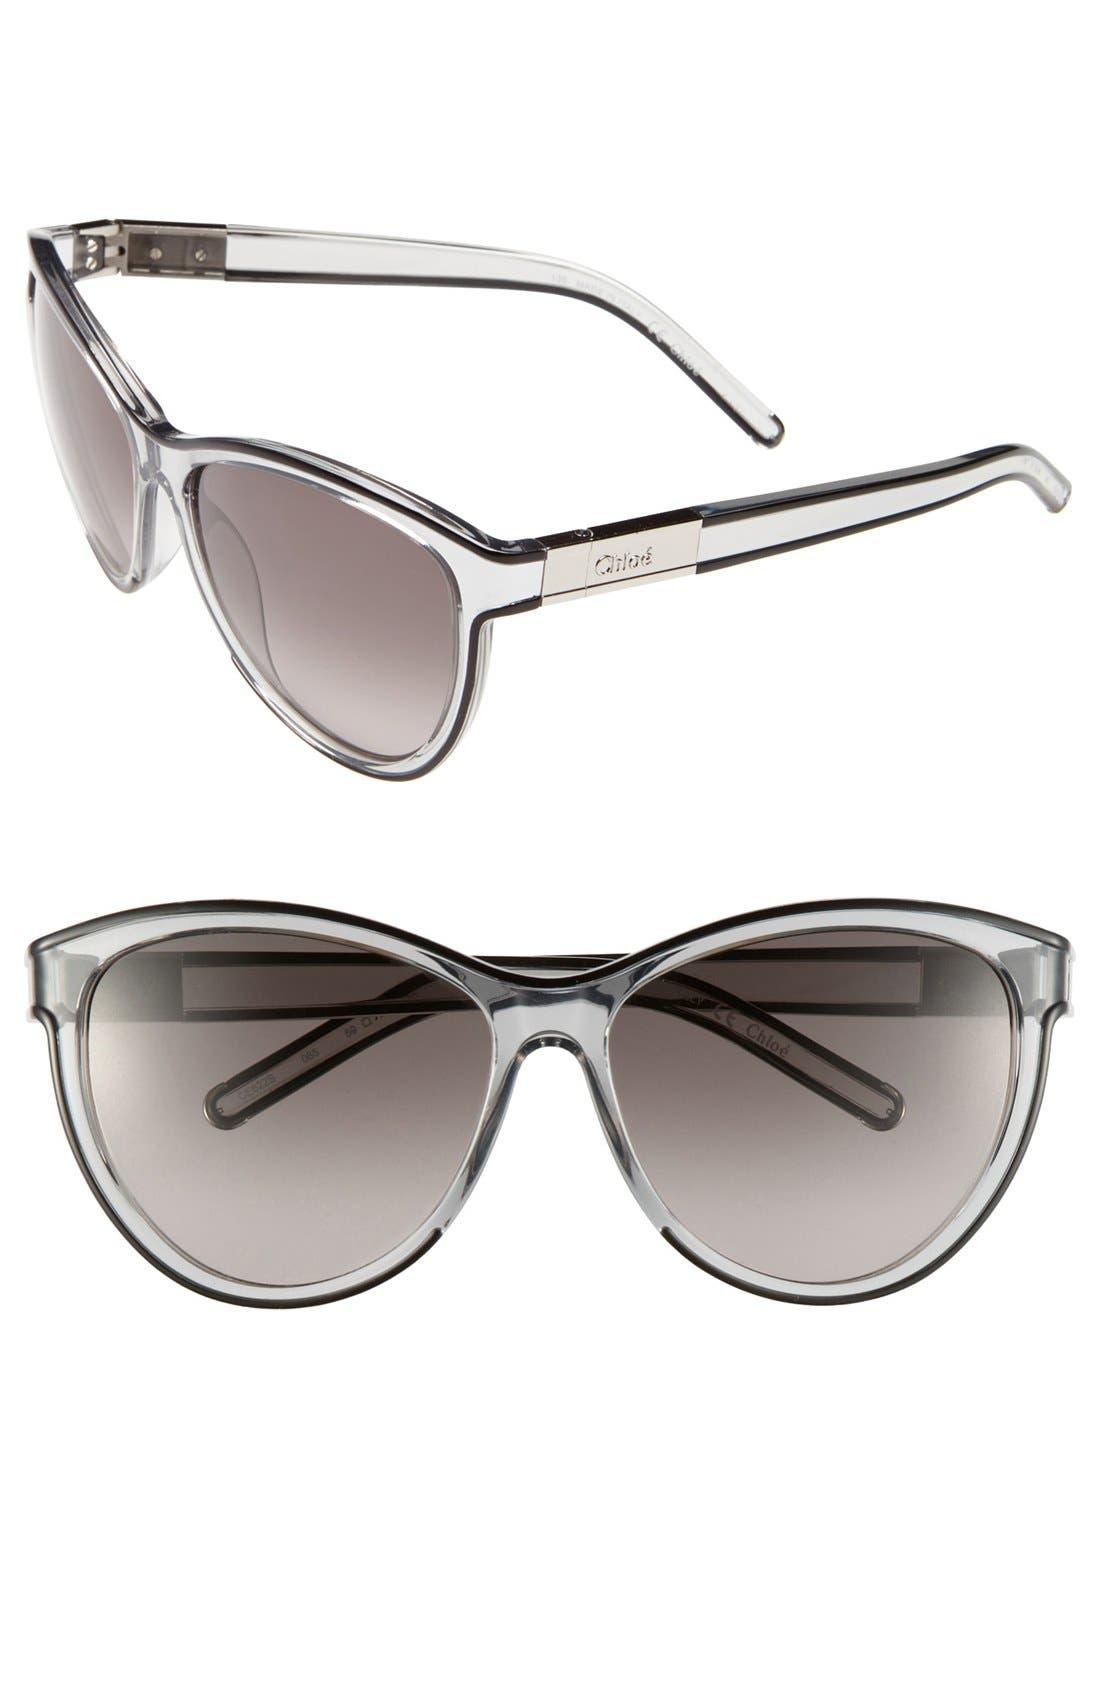 Main Image - Chloé 'Ivy' 59mm Sunglasses